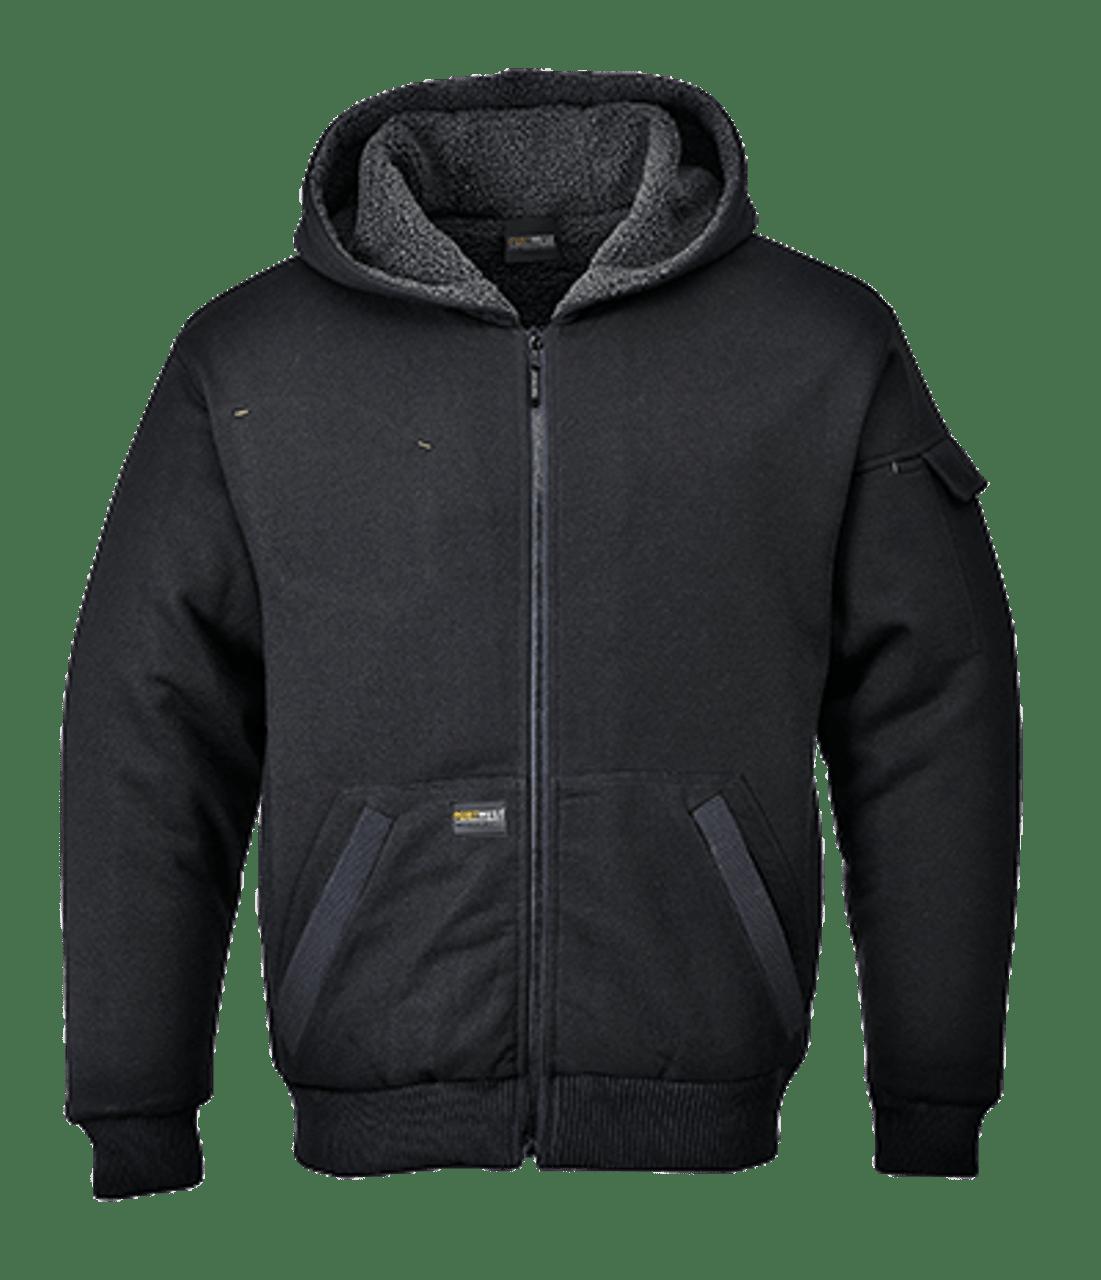 Portwest Pewter Jacket KS32